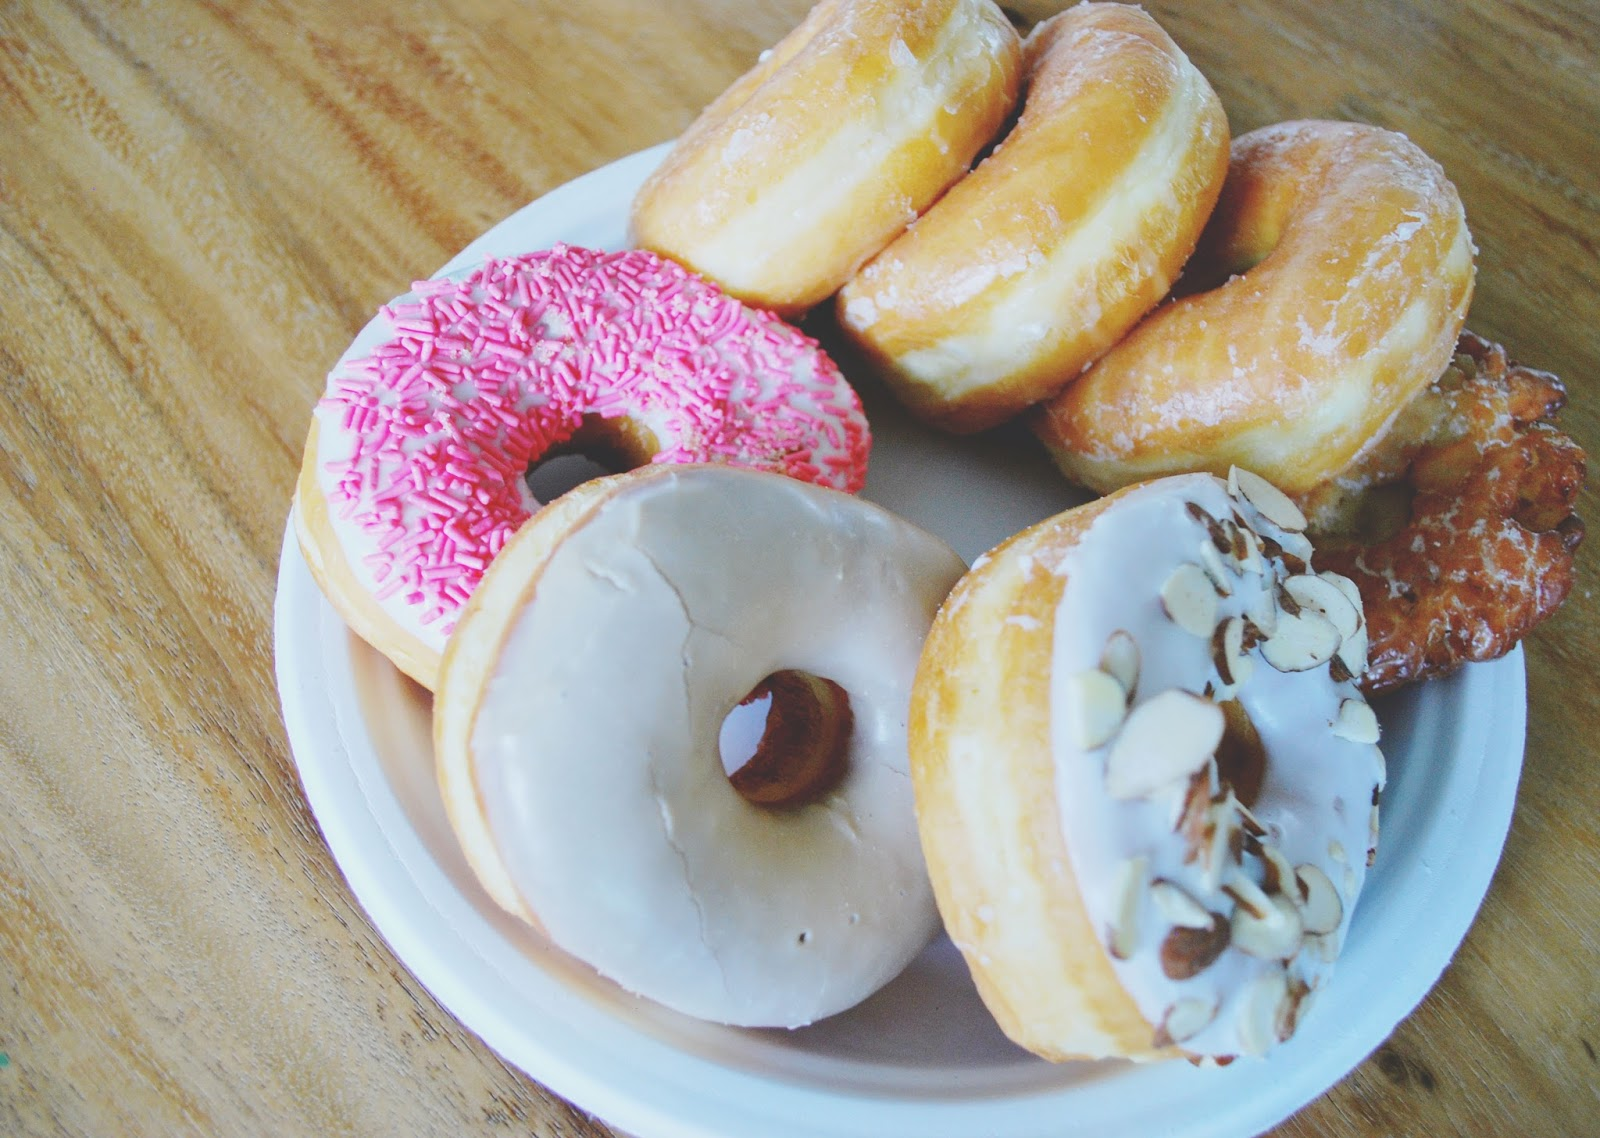 The Great Doughnut Debate - bakeries in Houston, Texas